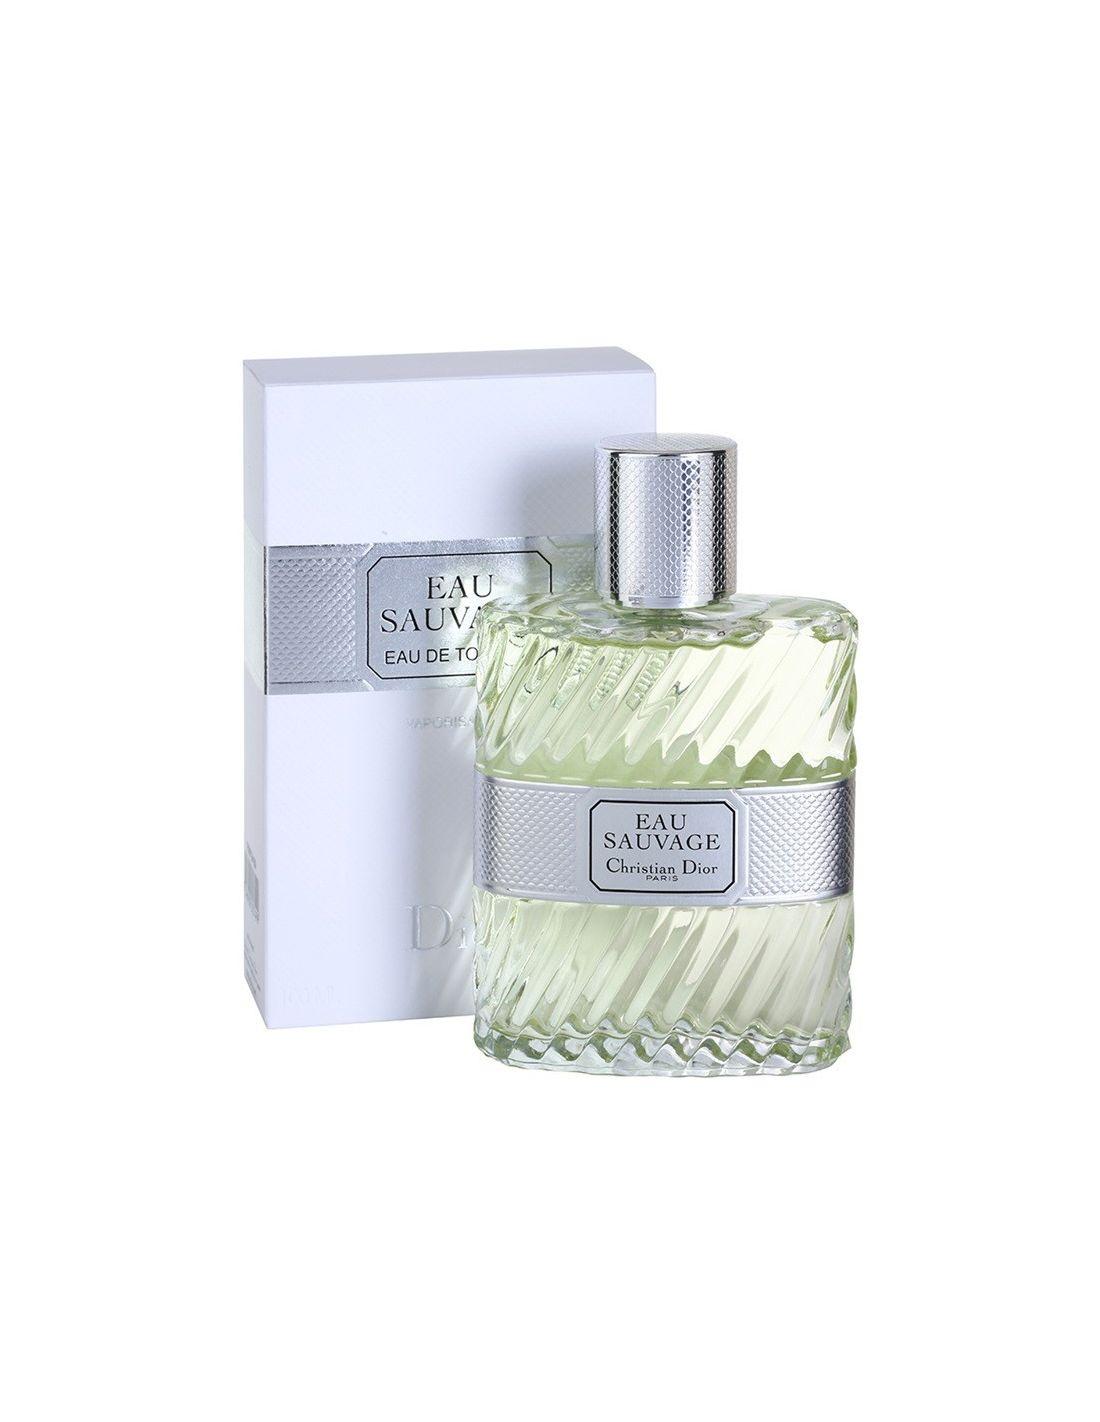 perfume eau sauvage eau de toilette 50 ml perfumes 24. Black Bedroom Furniture Sets. Home Design Ideas